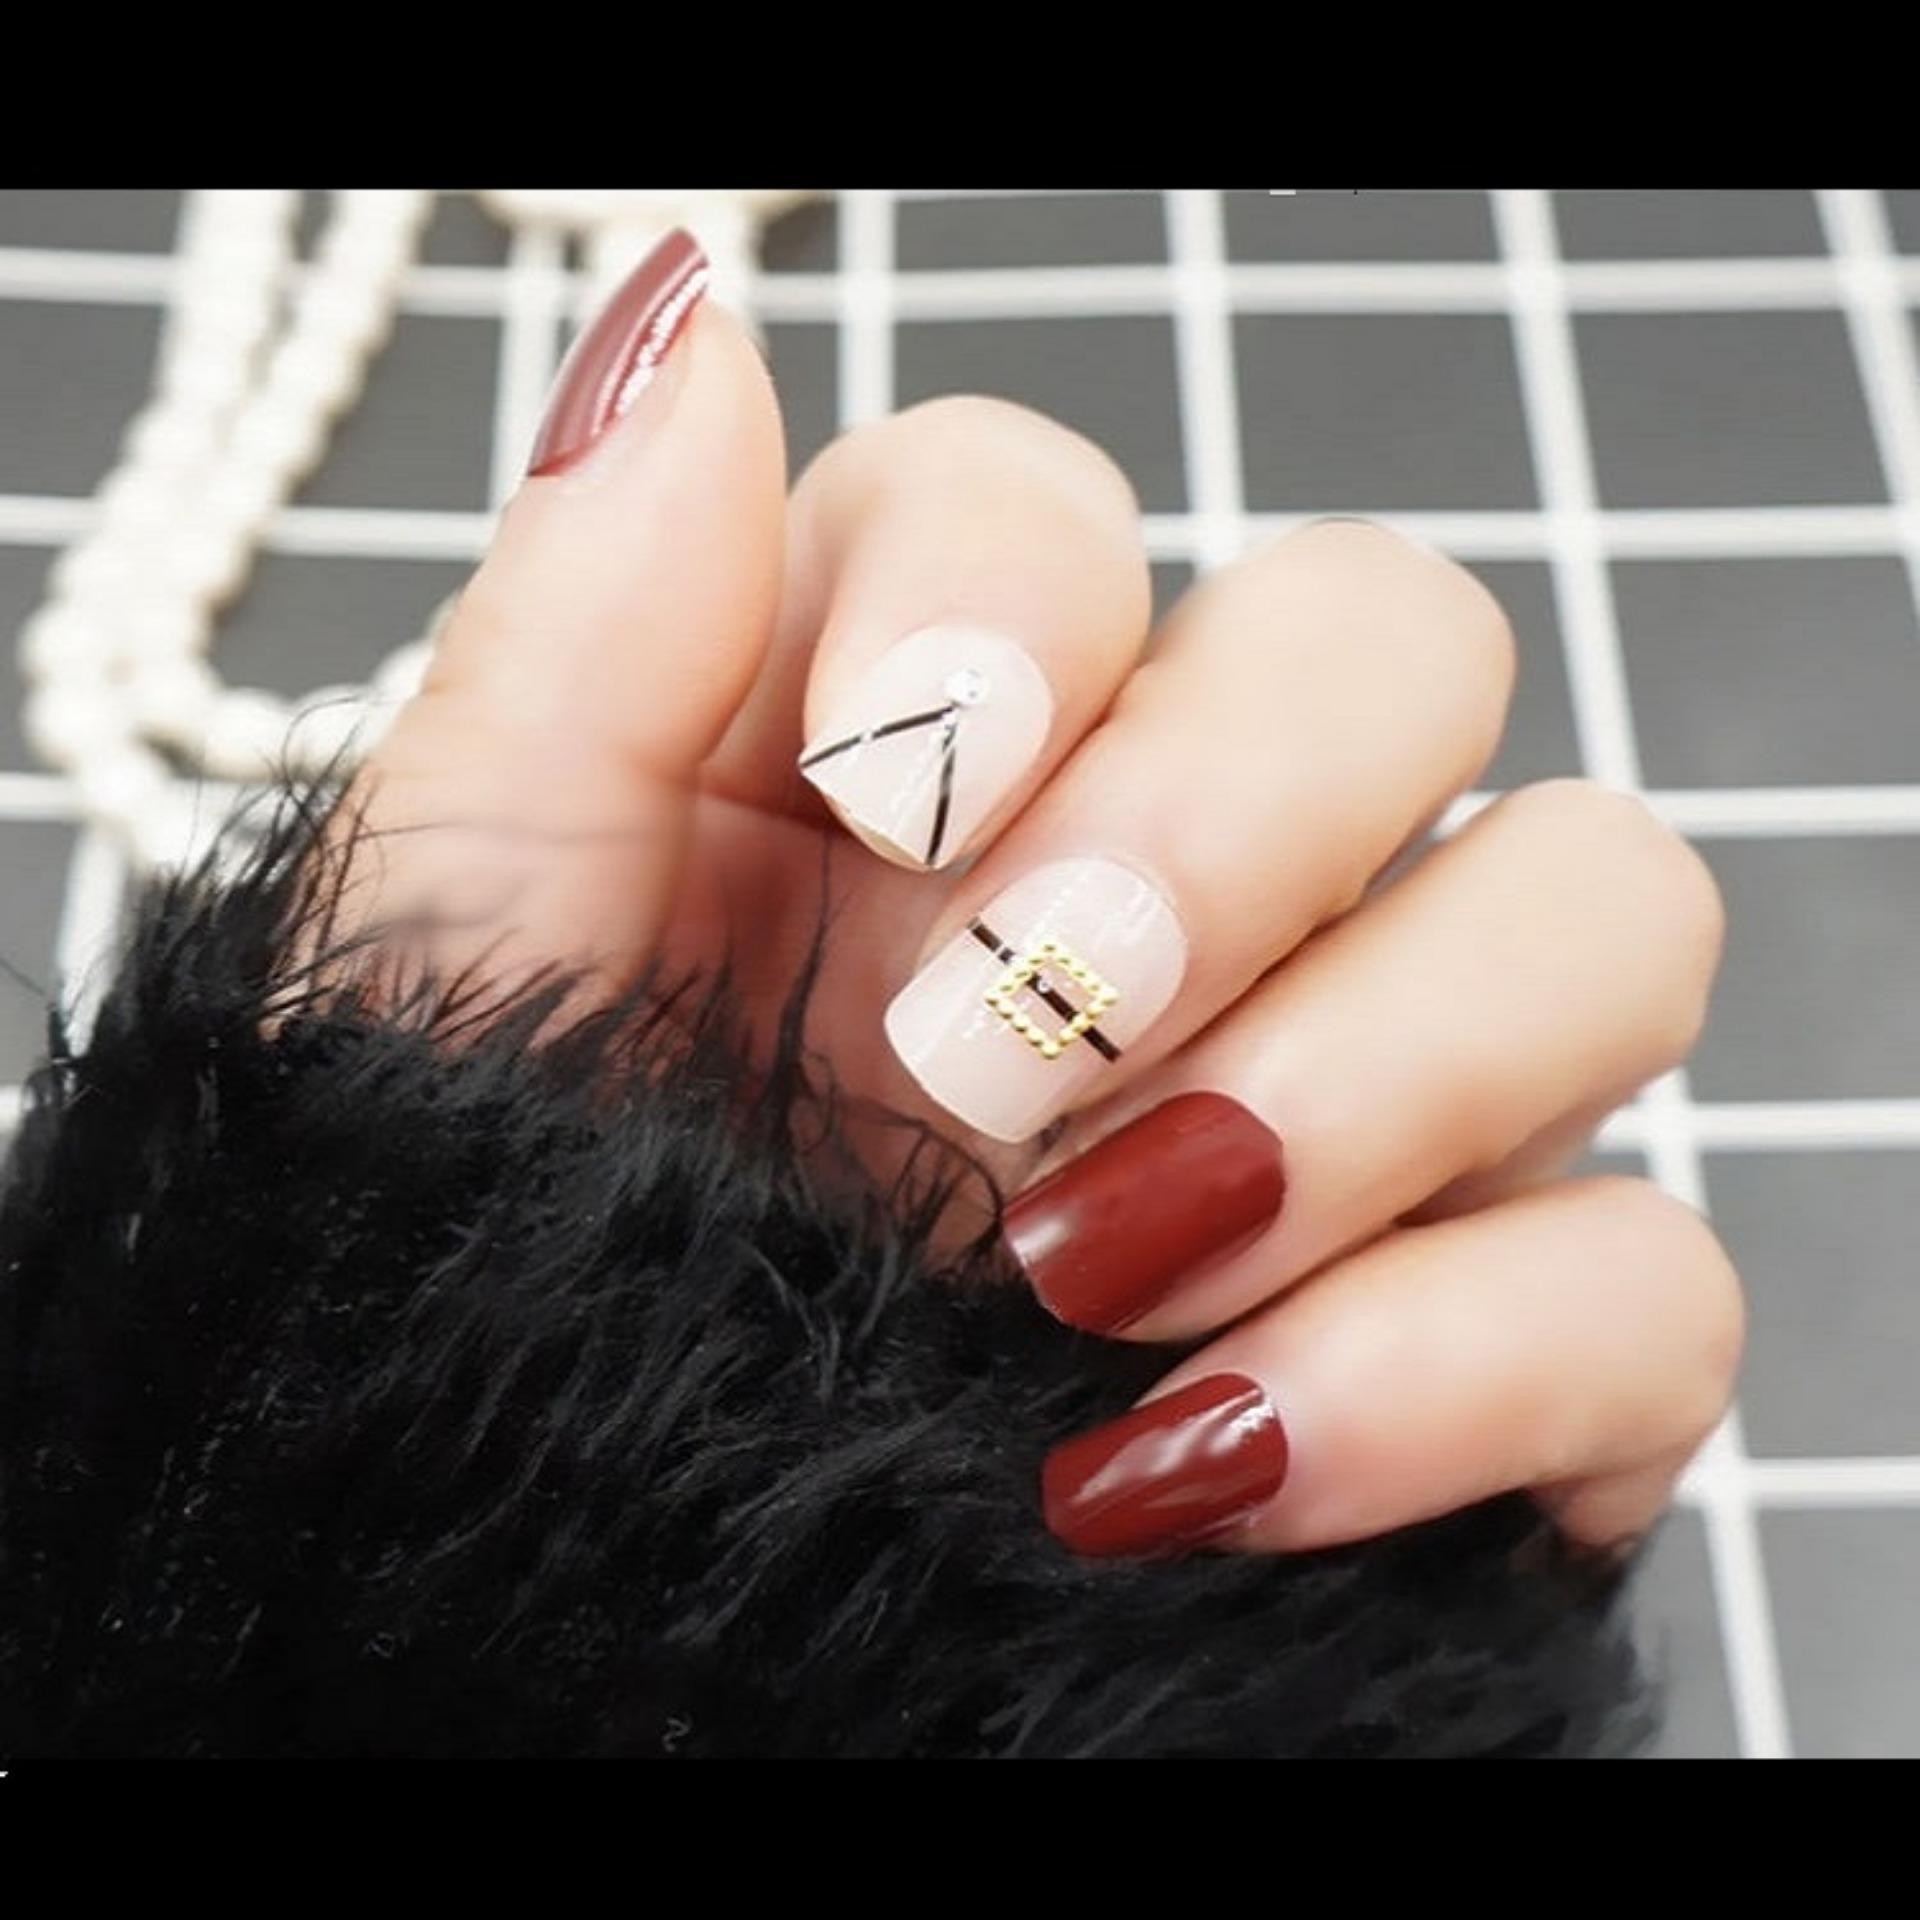 Fitur Jbs Nails Kuku Palsu Pengantin 3d A65 Dan Harga Terbaru Wedding Fake Nail Art Simple A13 Warna A26